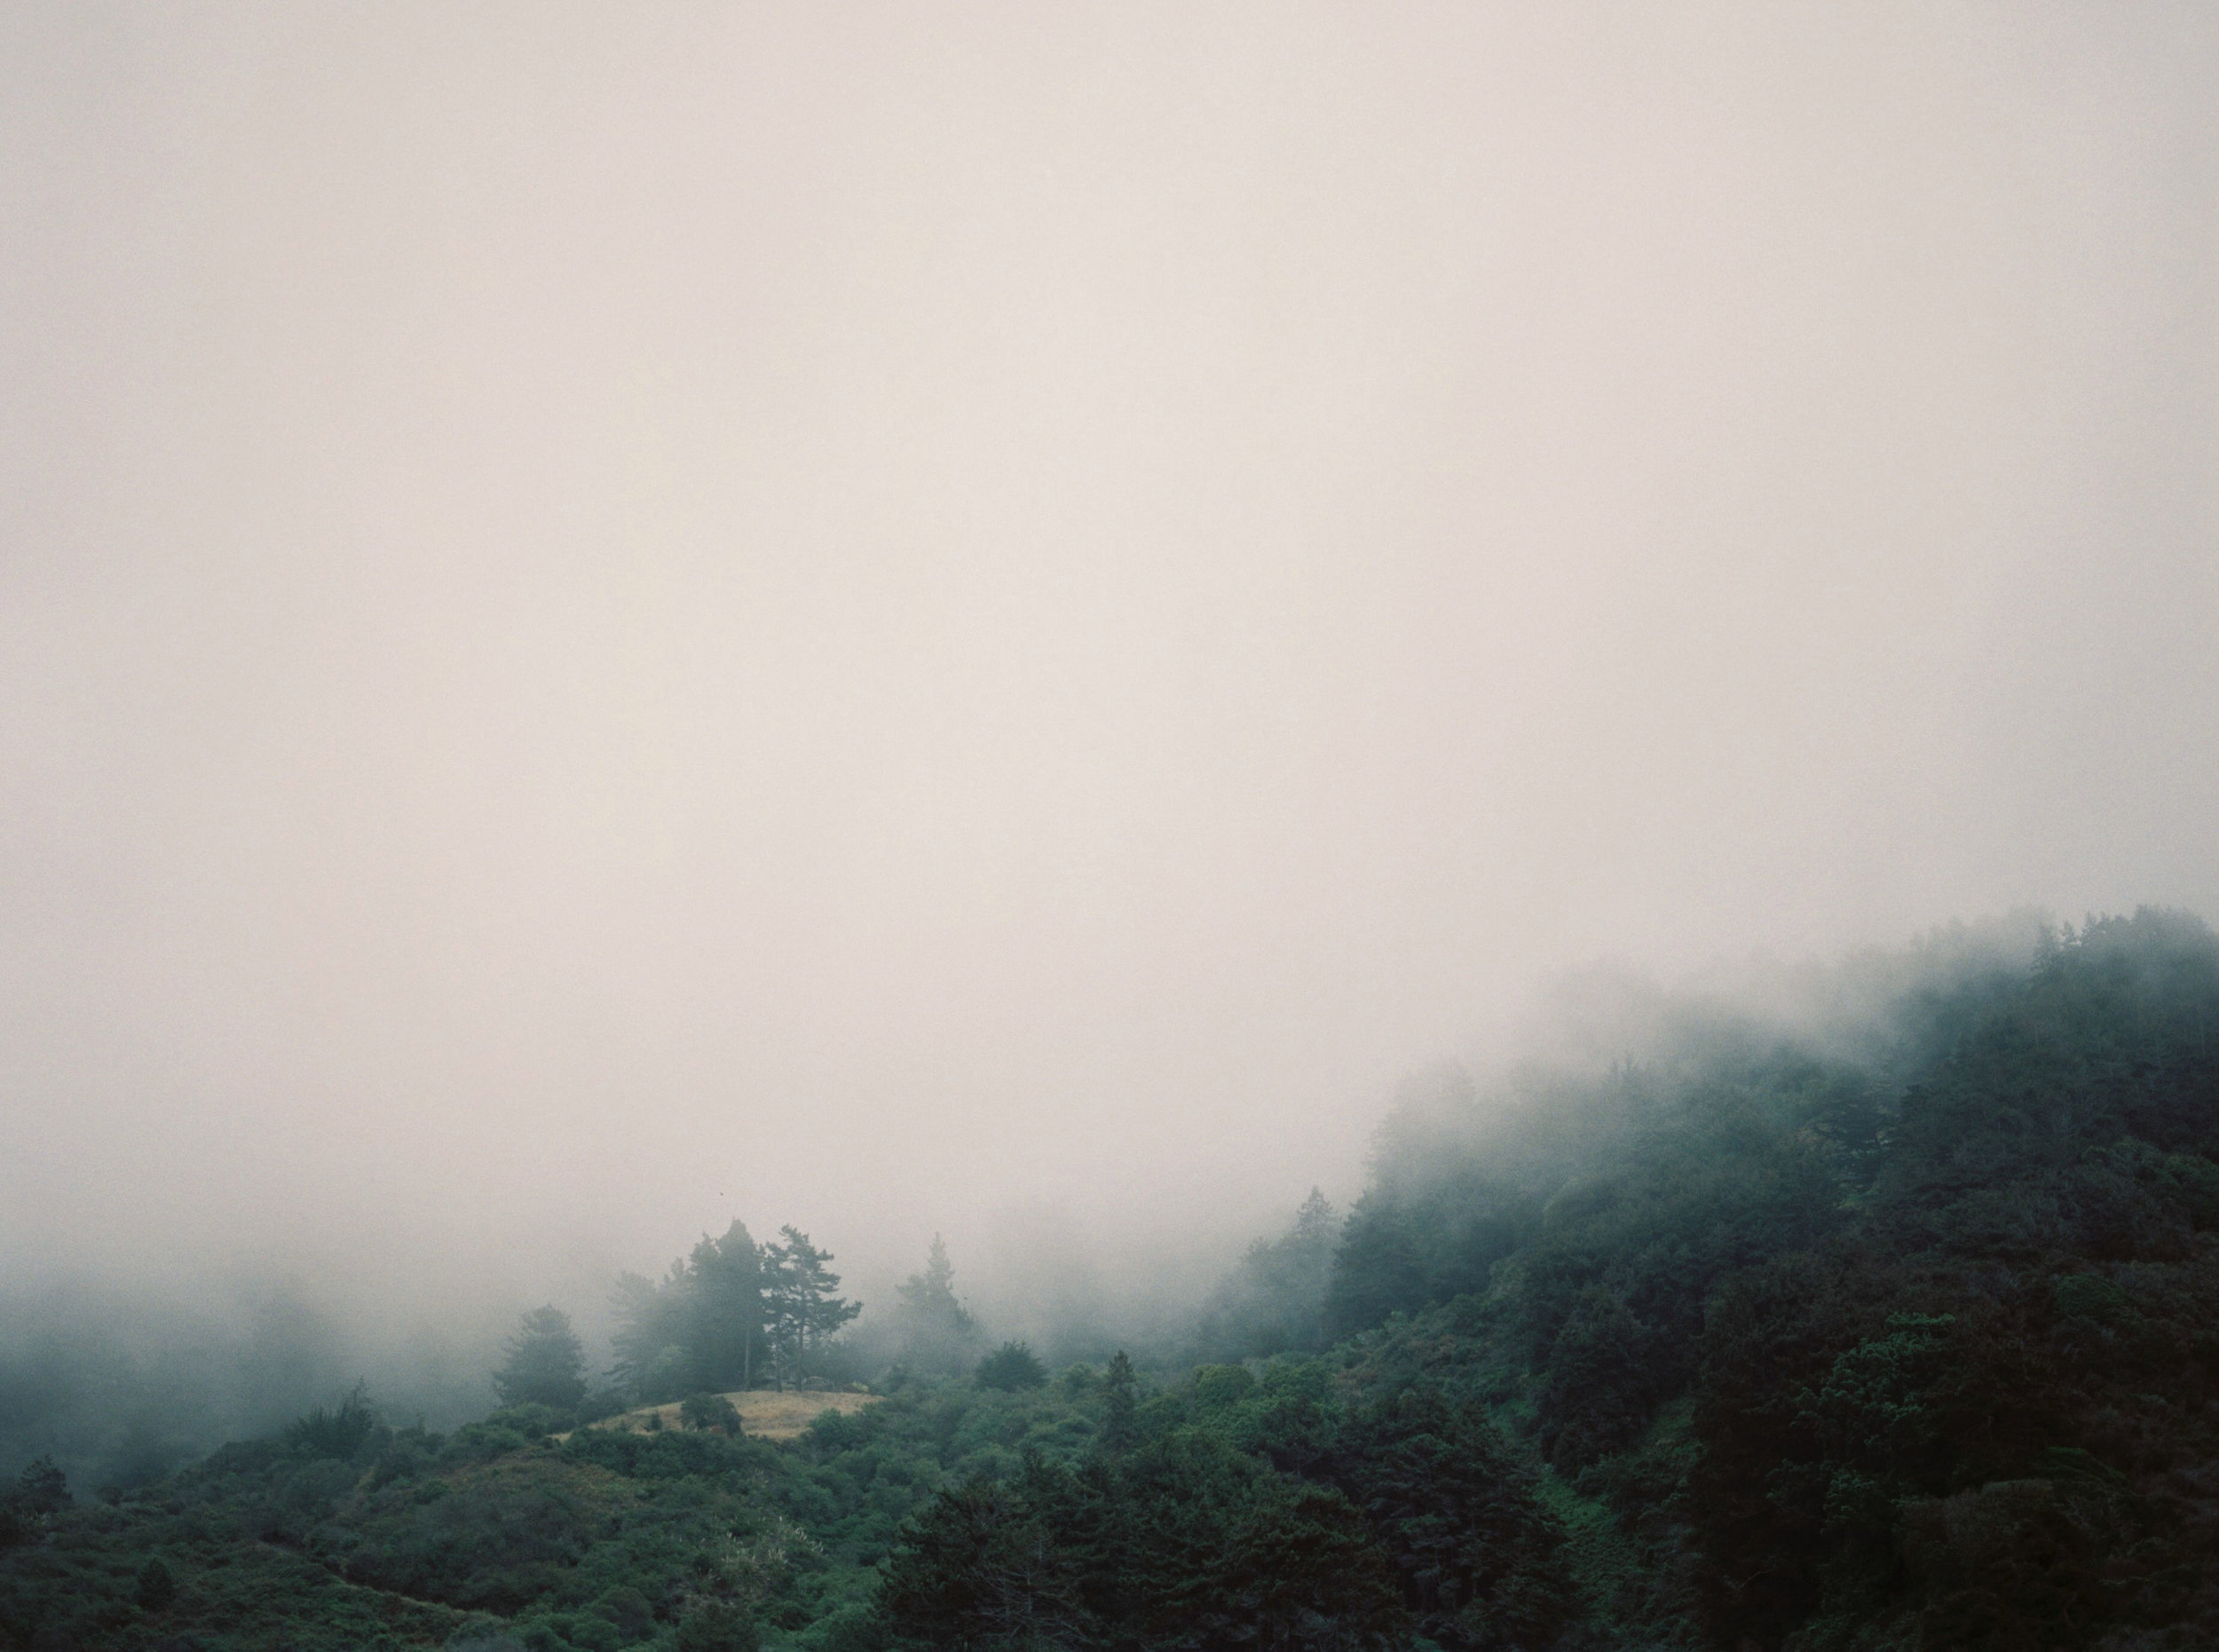 jakeanderson-filmphotographer-destinatinophotographer-travel-unearthingtc-37.jpg